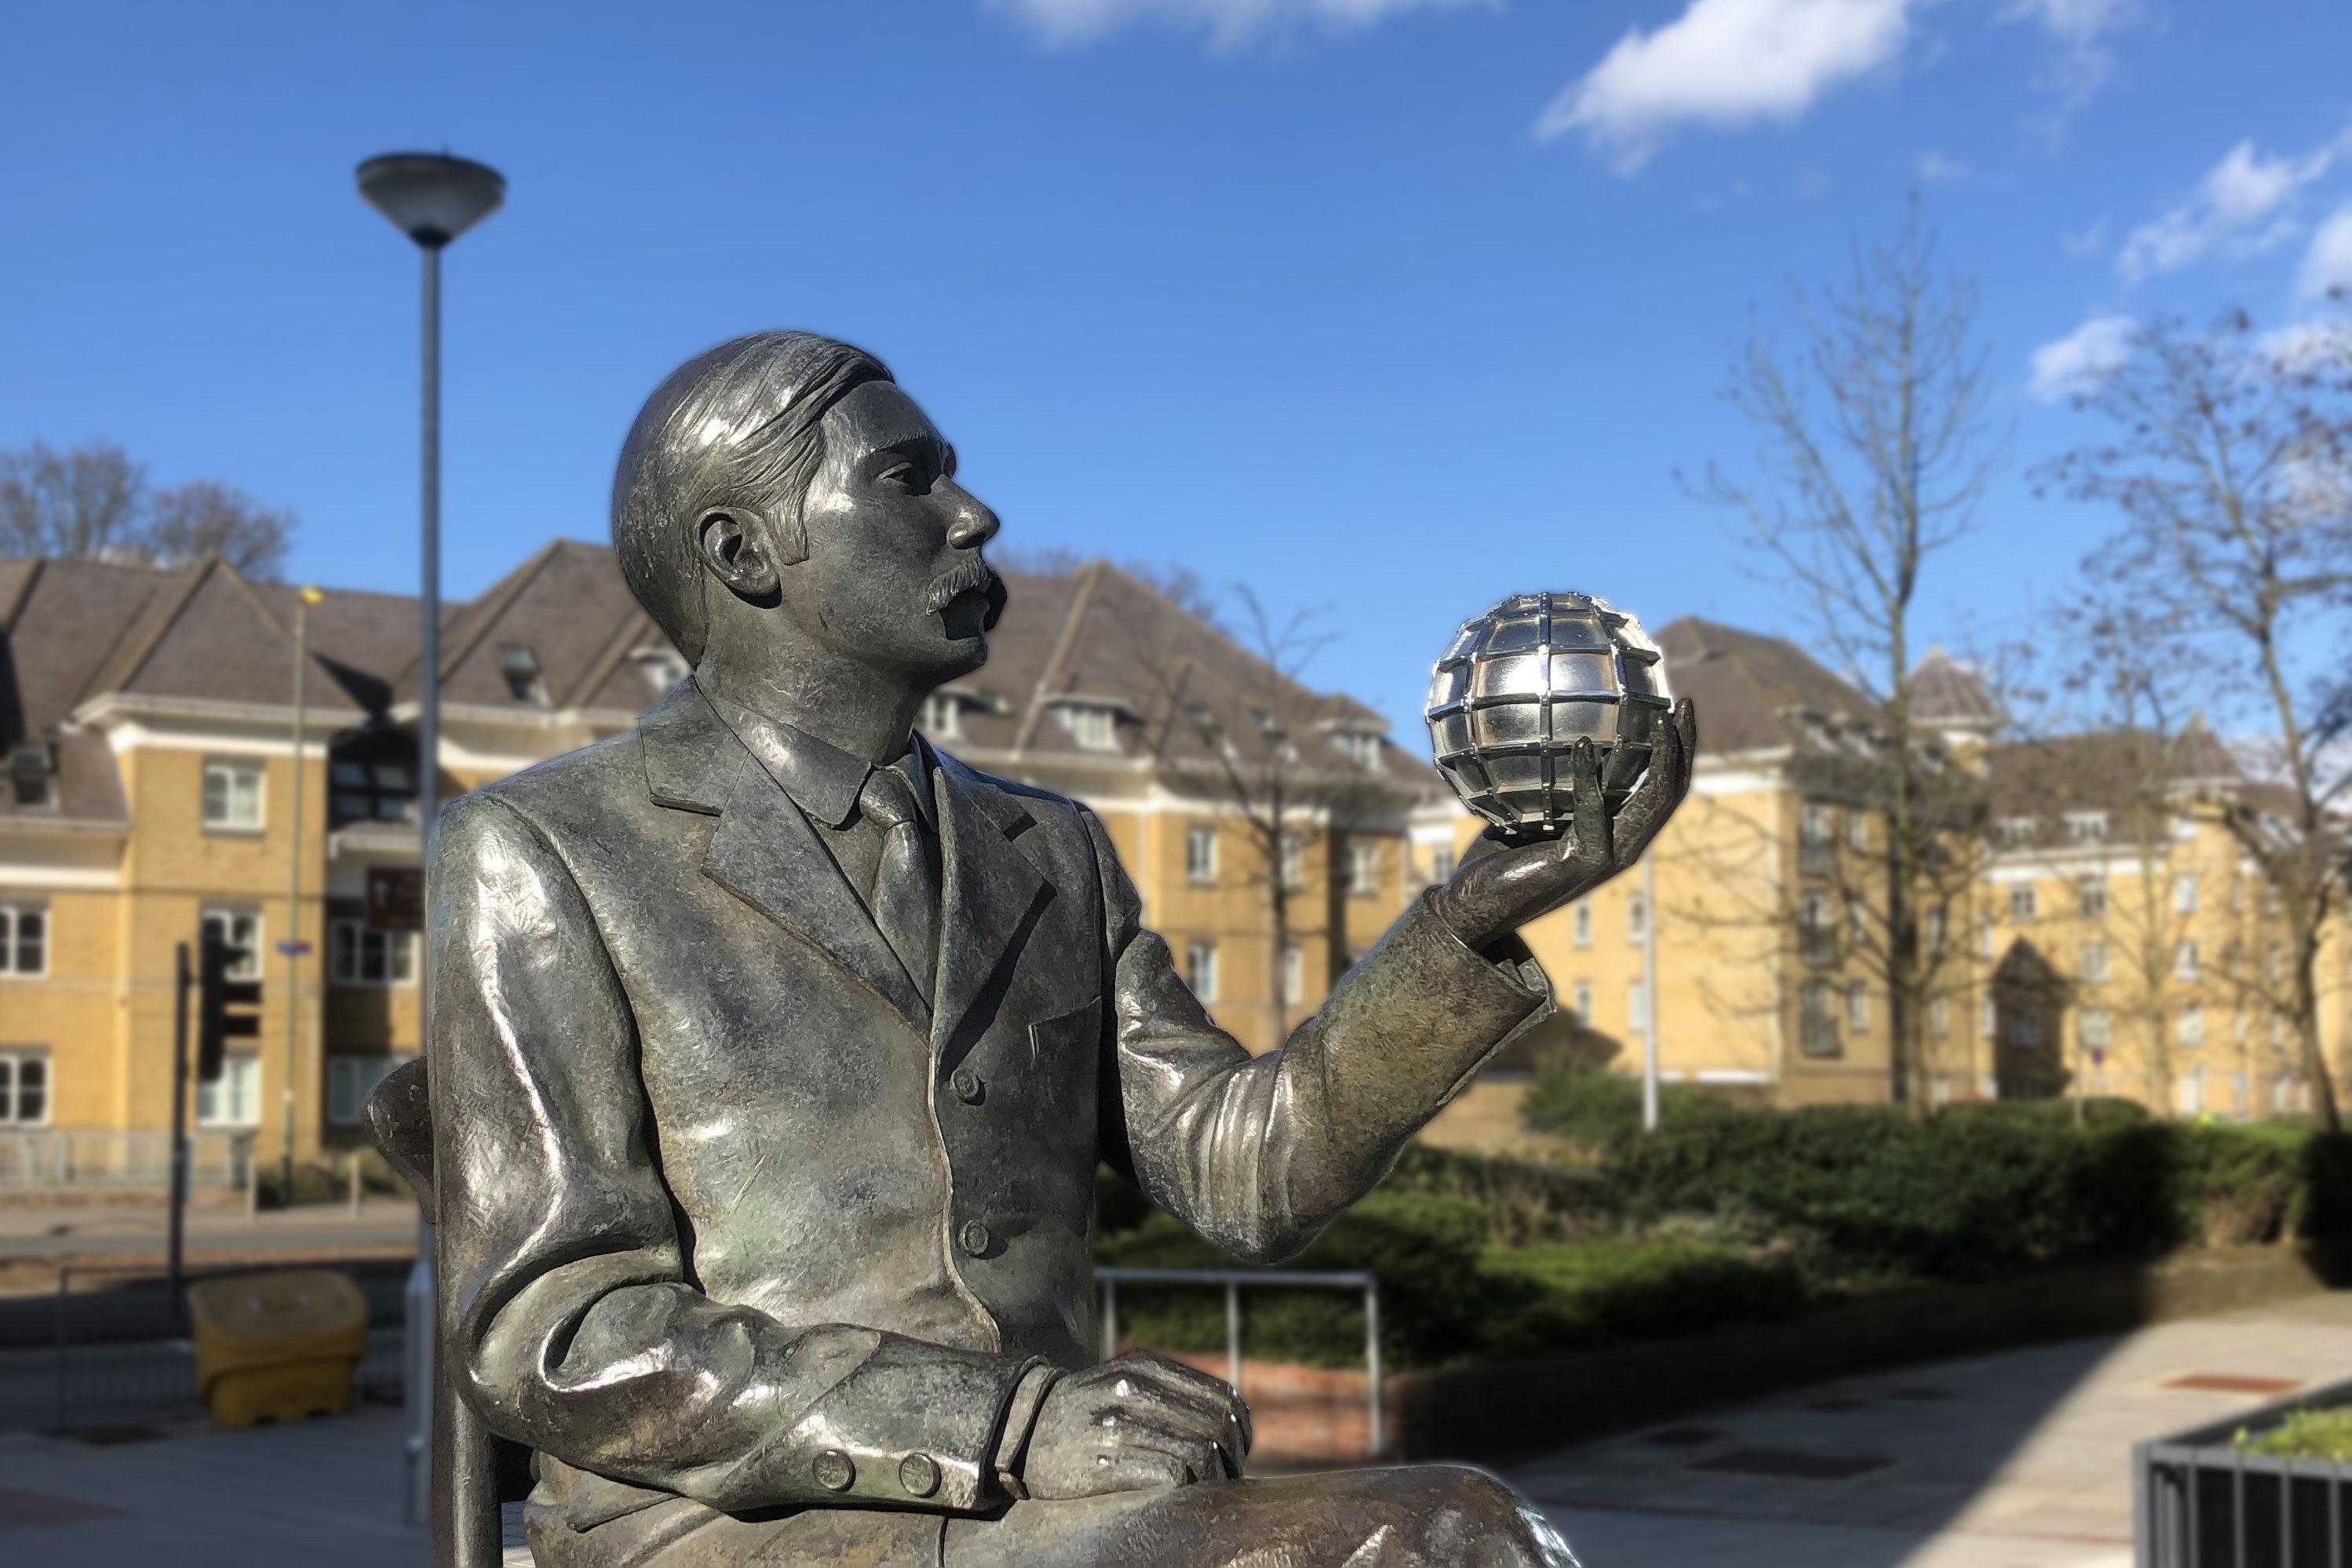 3. H. G. Wells Statue